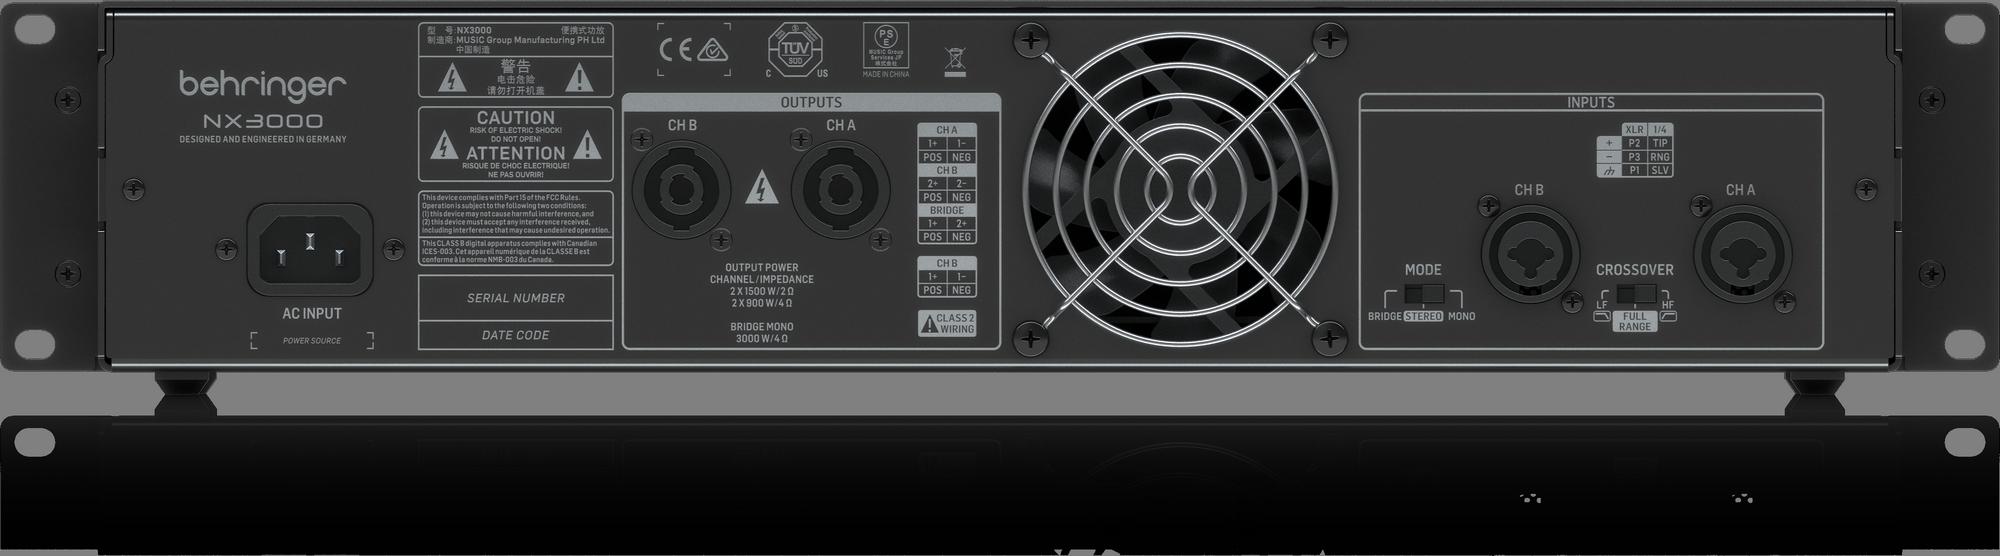 Behringer NX3000 Amplifier